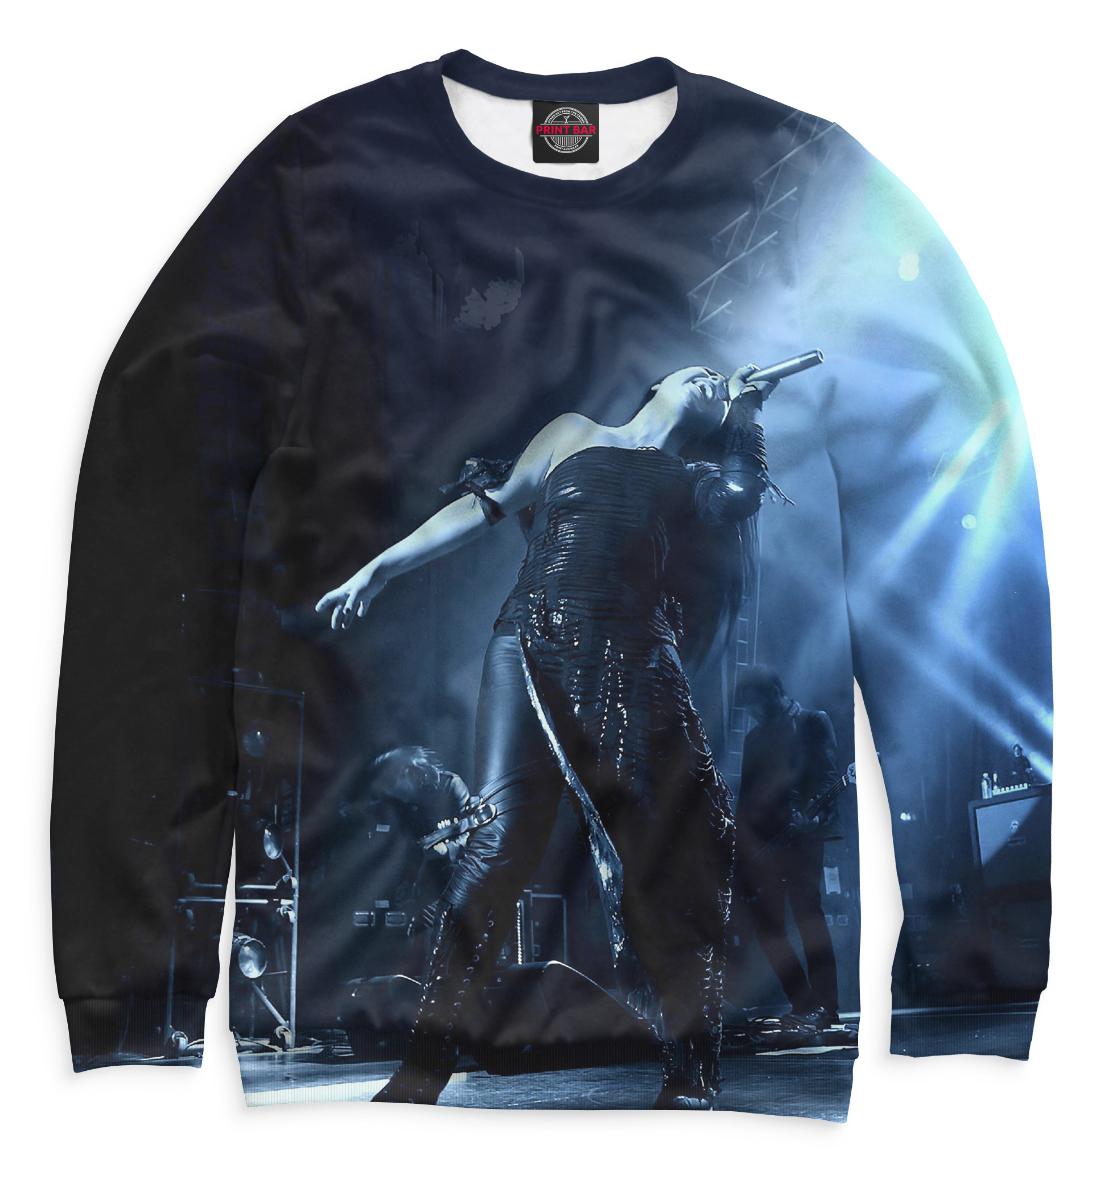 Купить Evanescence, Printbar, Свитшоты, EVN-586879-swi-2